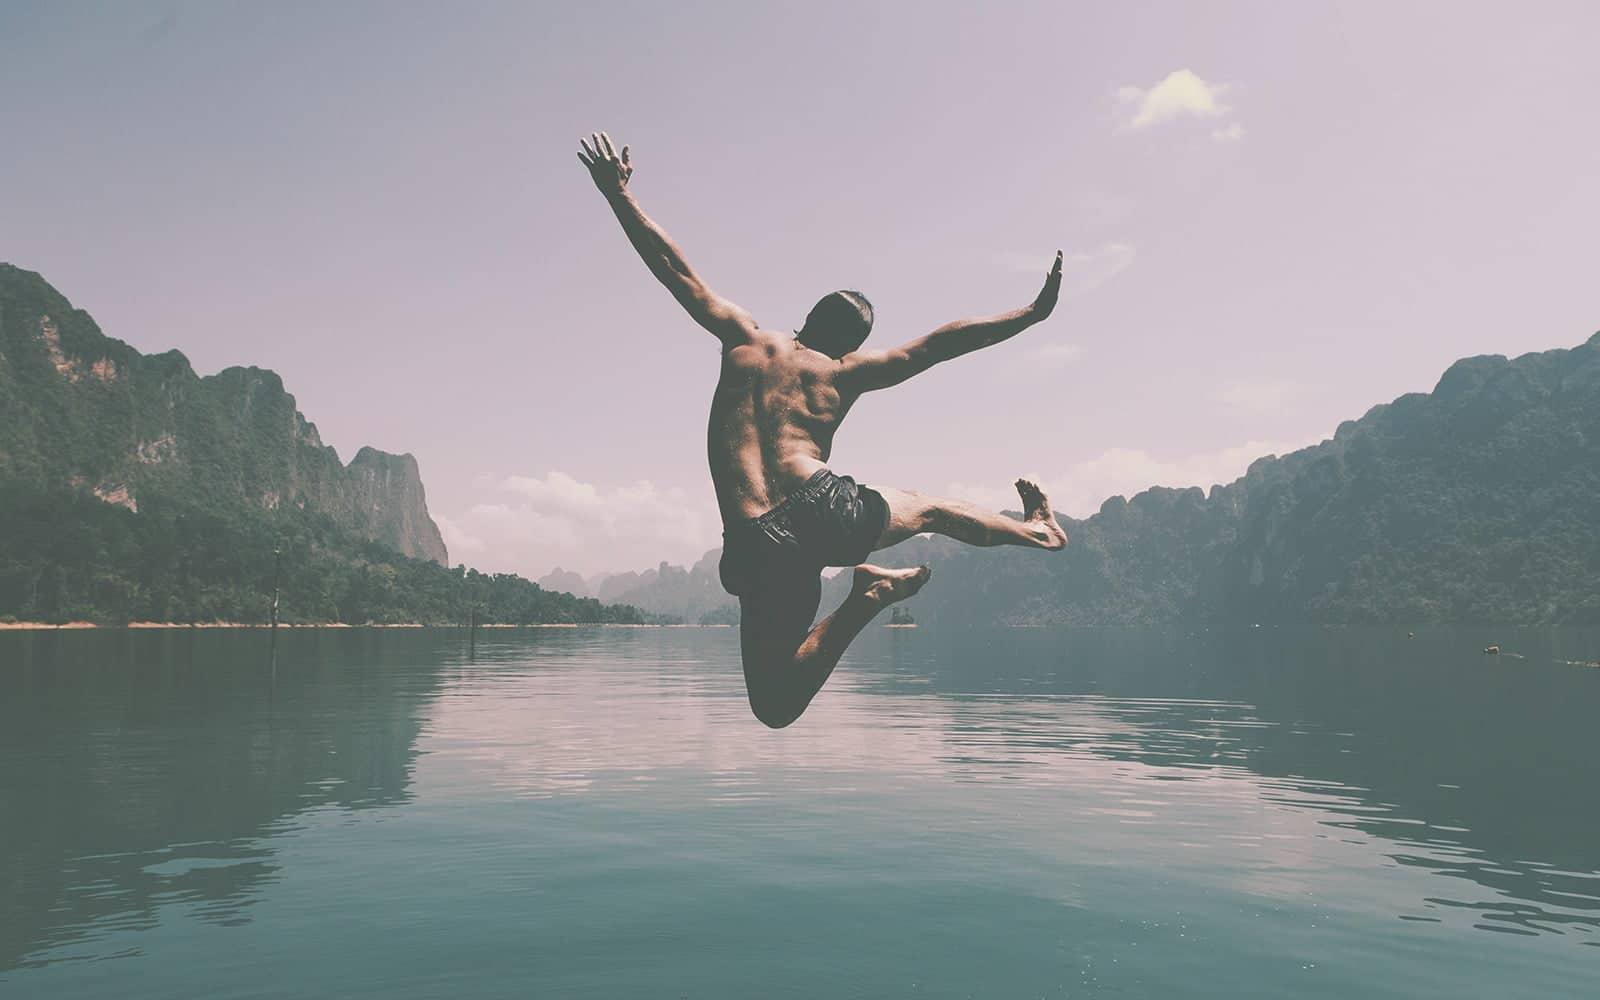 o-tok-ako-dokaze-motivacia-ovplyvnit-zivot